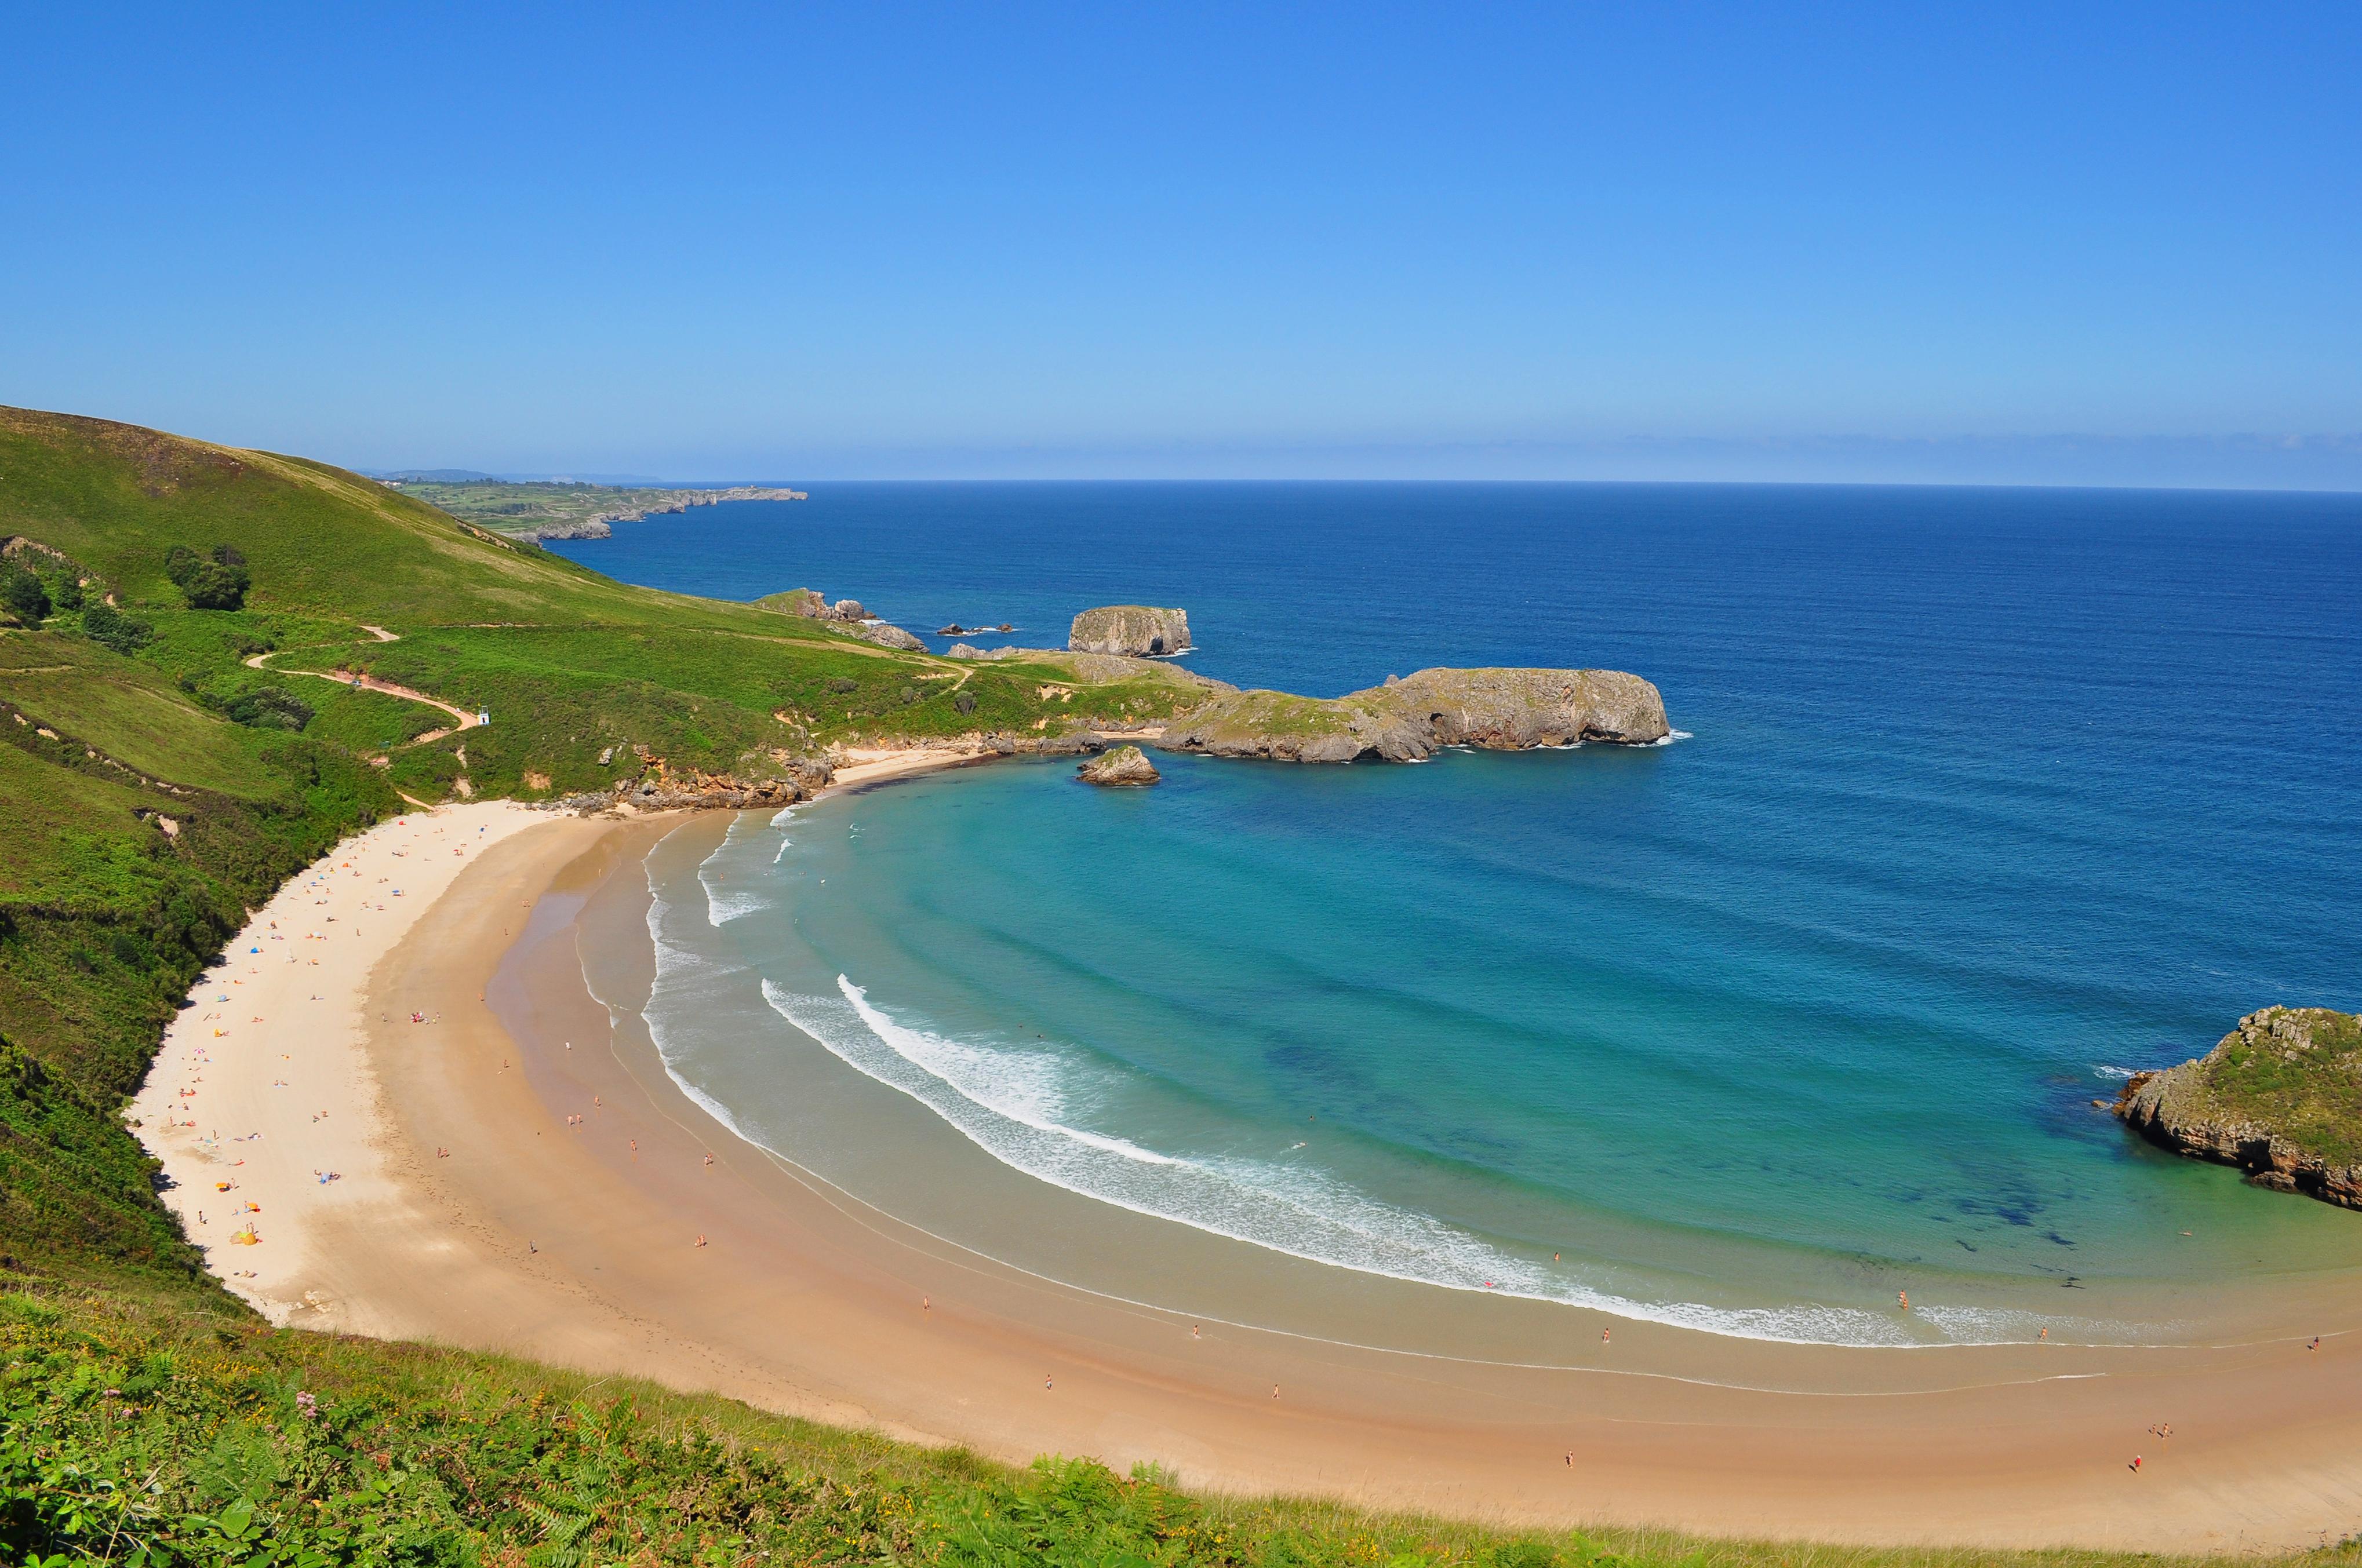 Playa de Torimbia 13 km